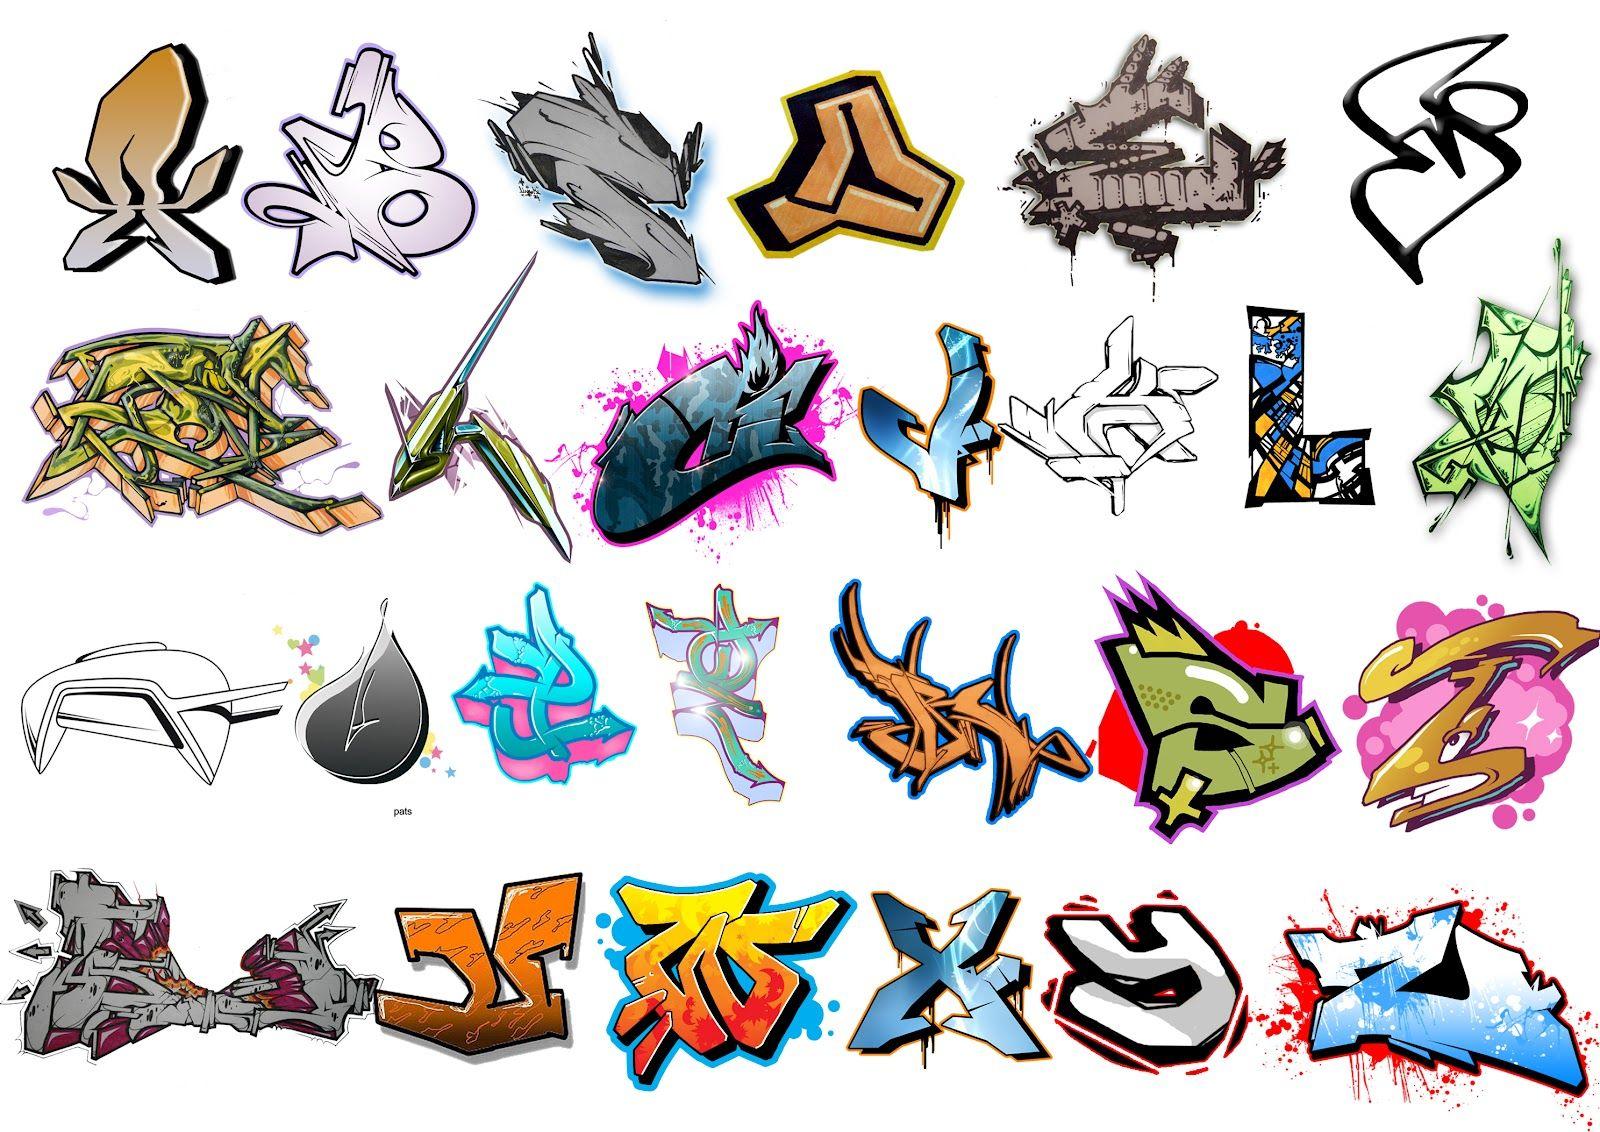 Abecedario de graffiti a z letras graffitis graffiti d в 2019 г граффити стрит арт и